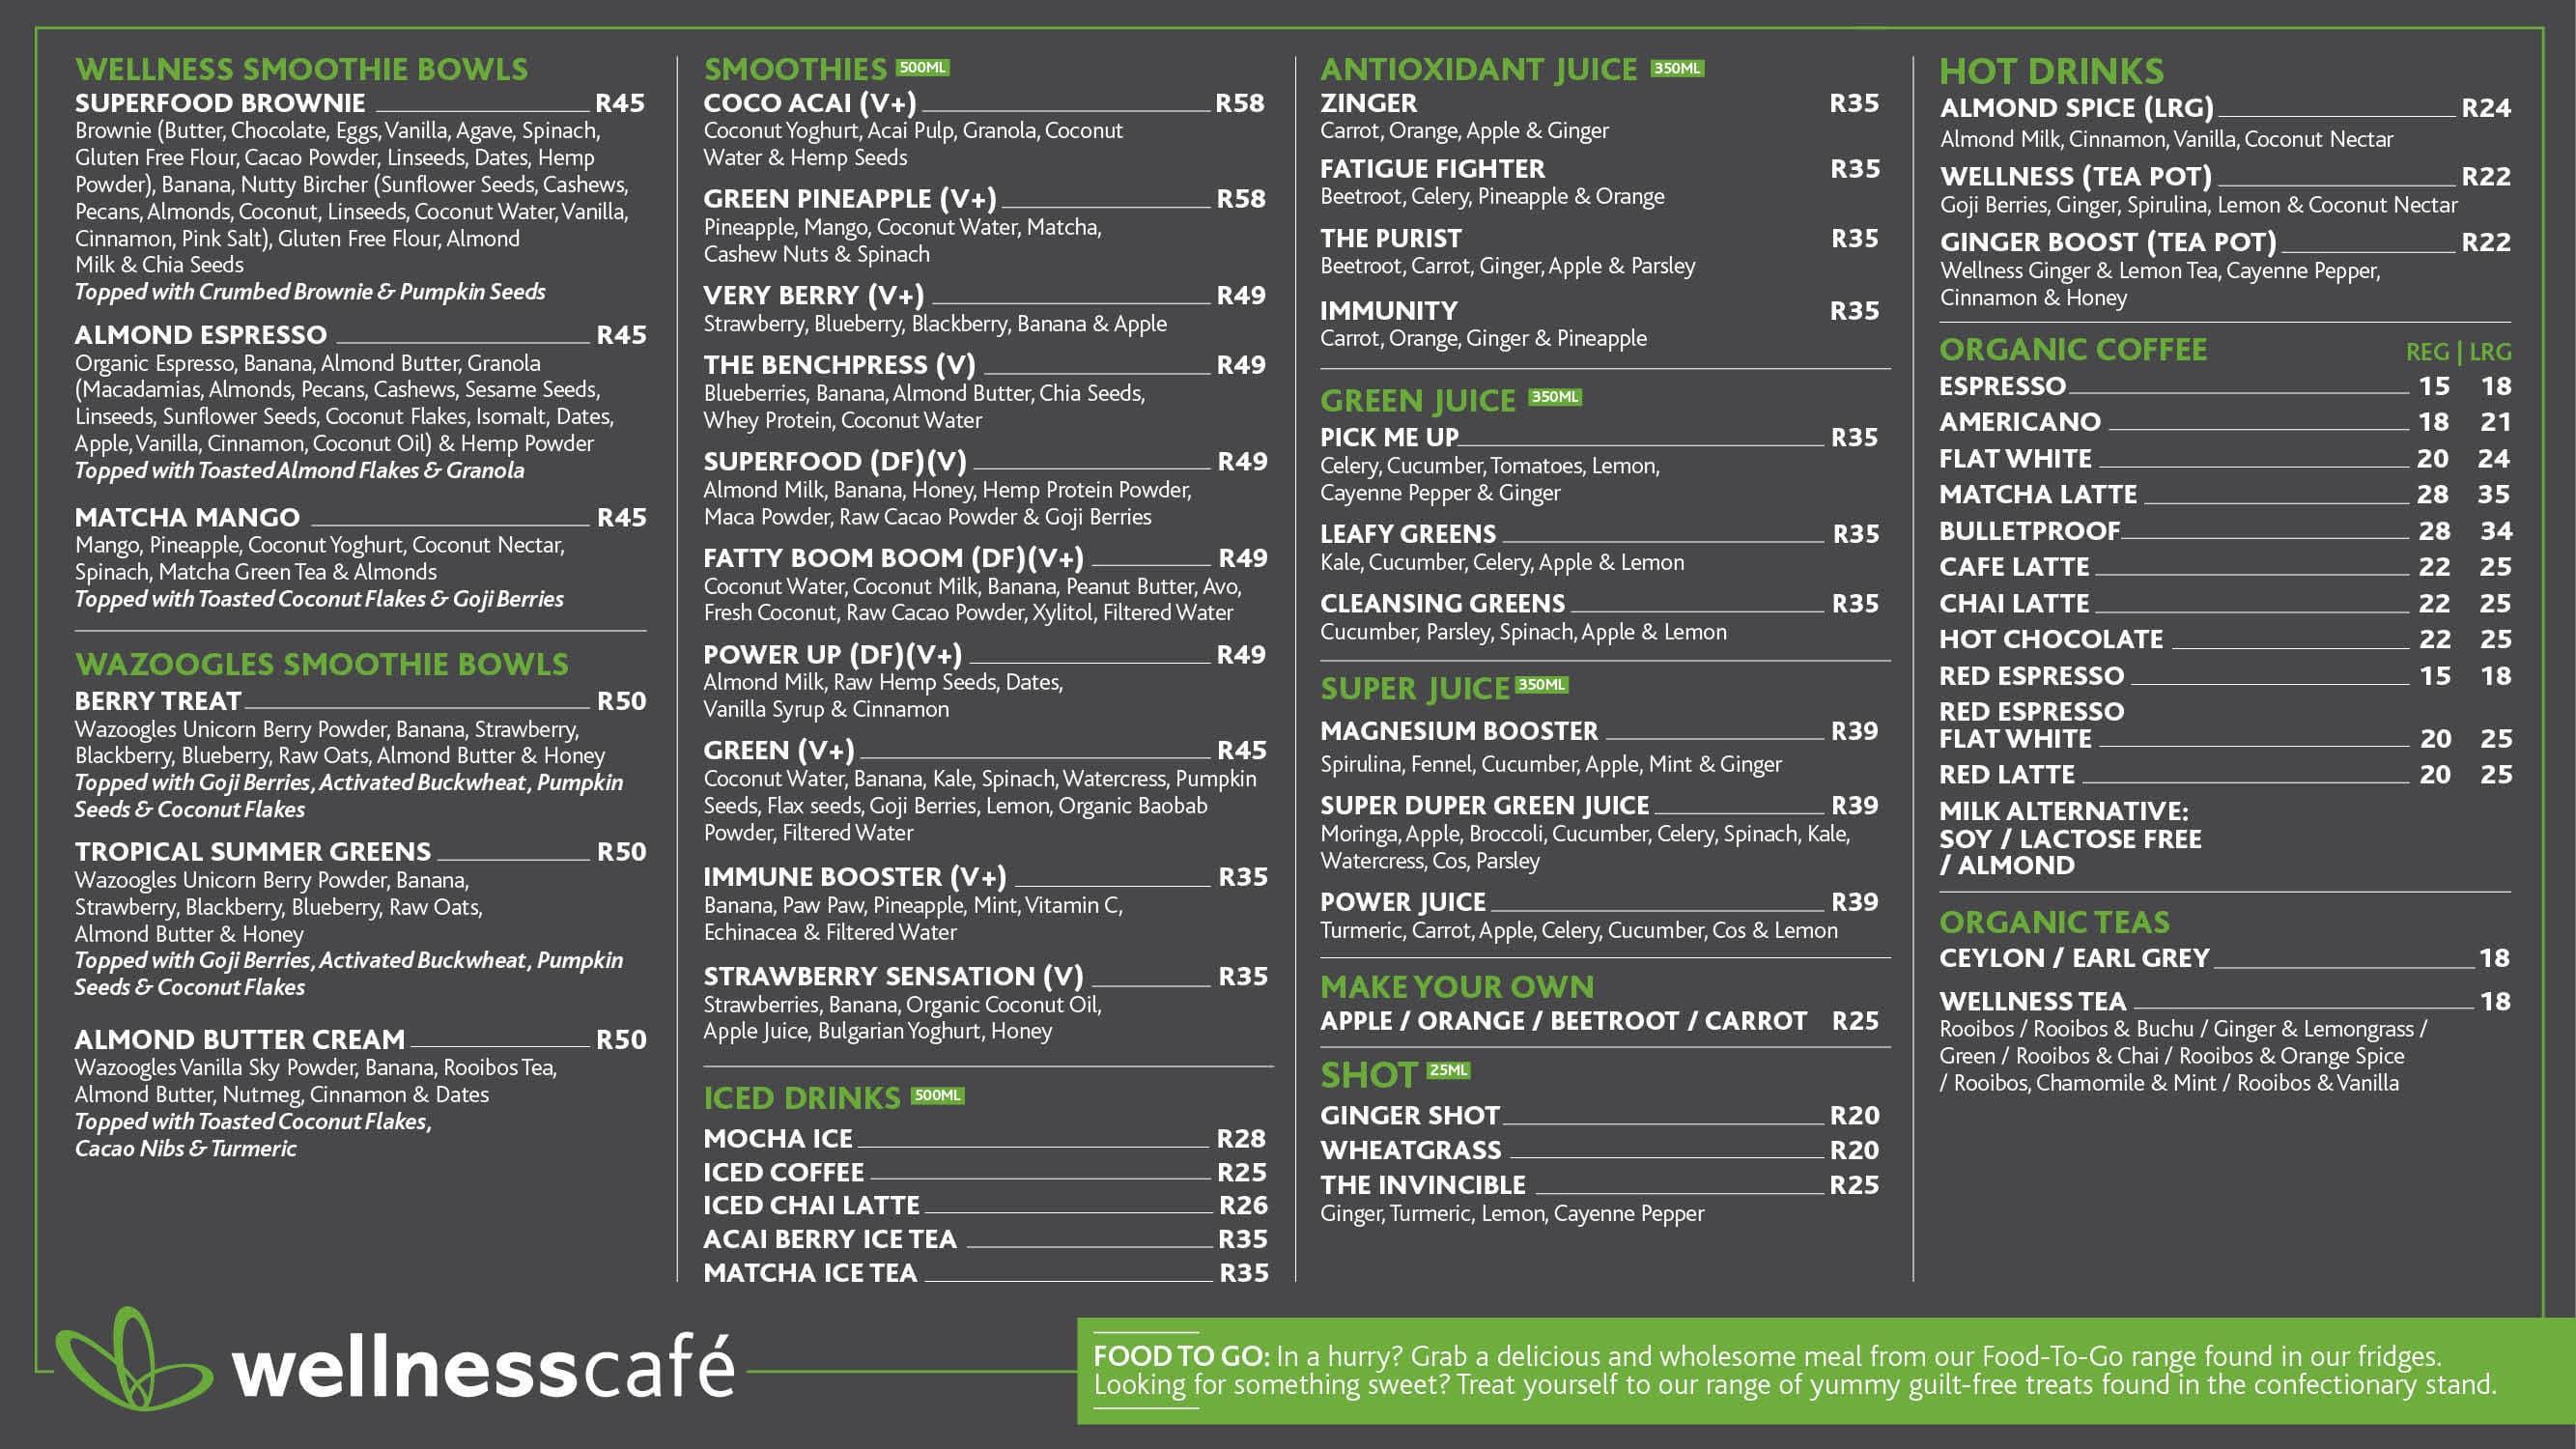 Geliebte Wellness Cafe Menu, Menu for Wellness Cafe, Waterkloof Glen @HK_71